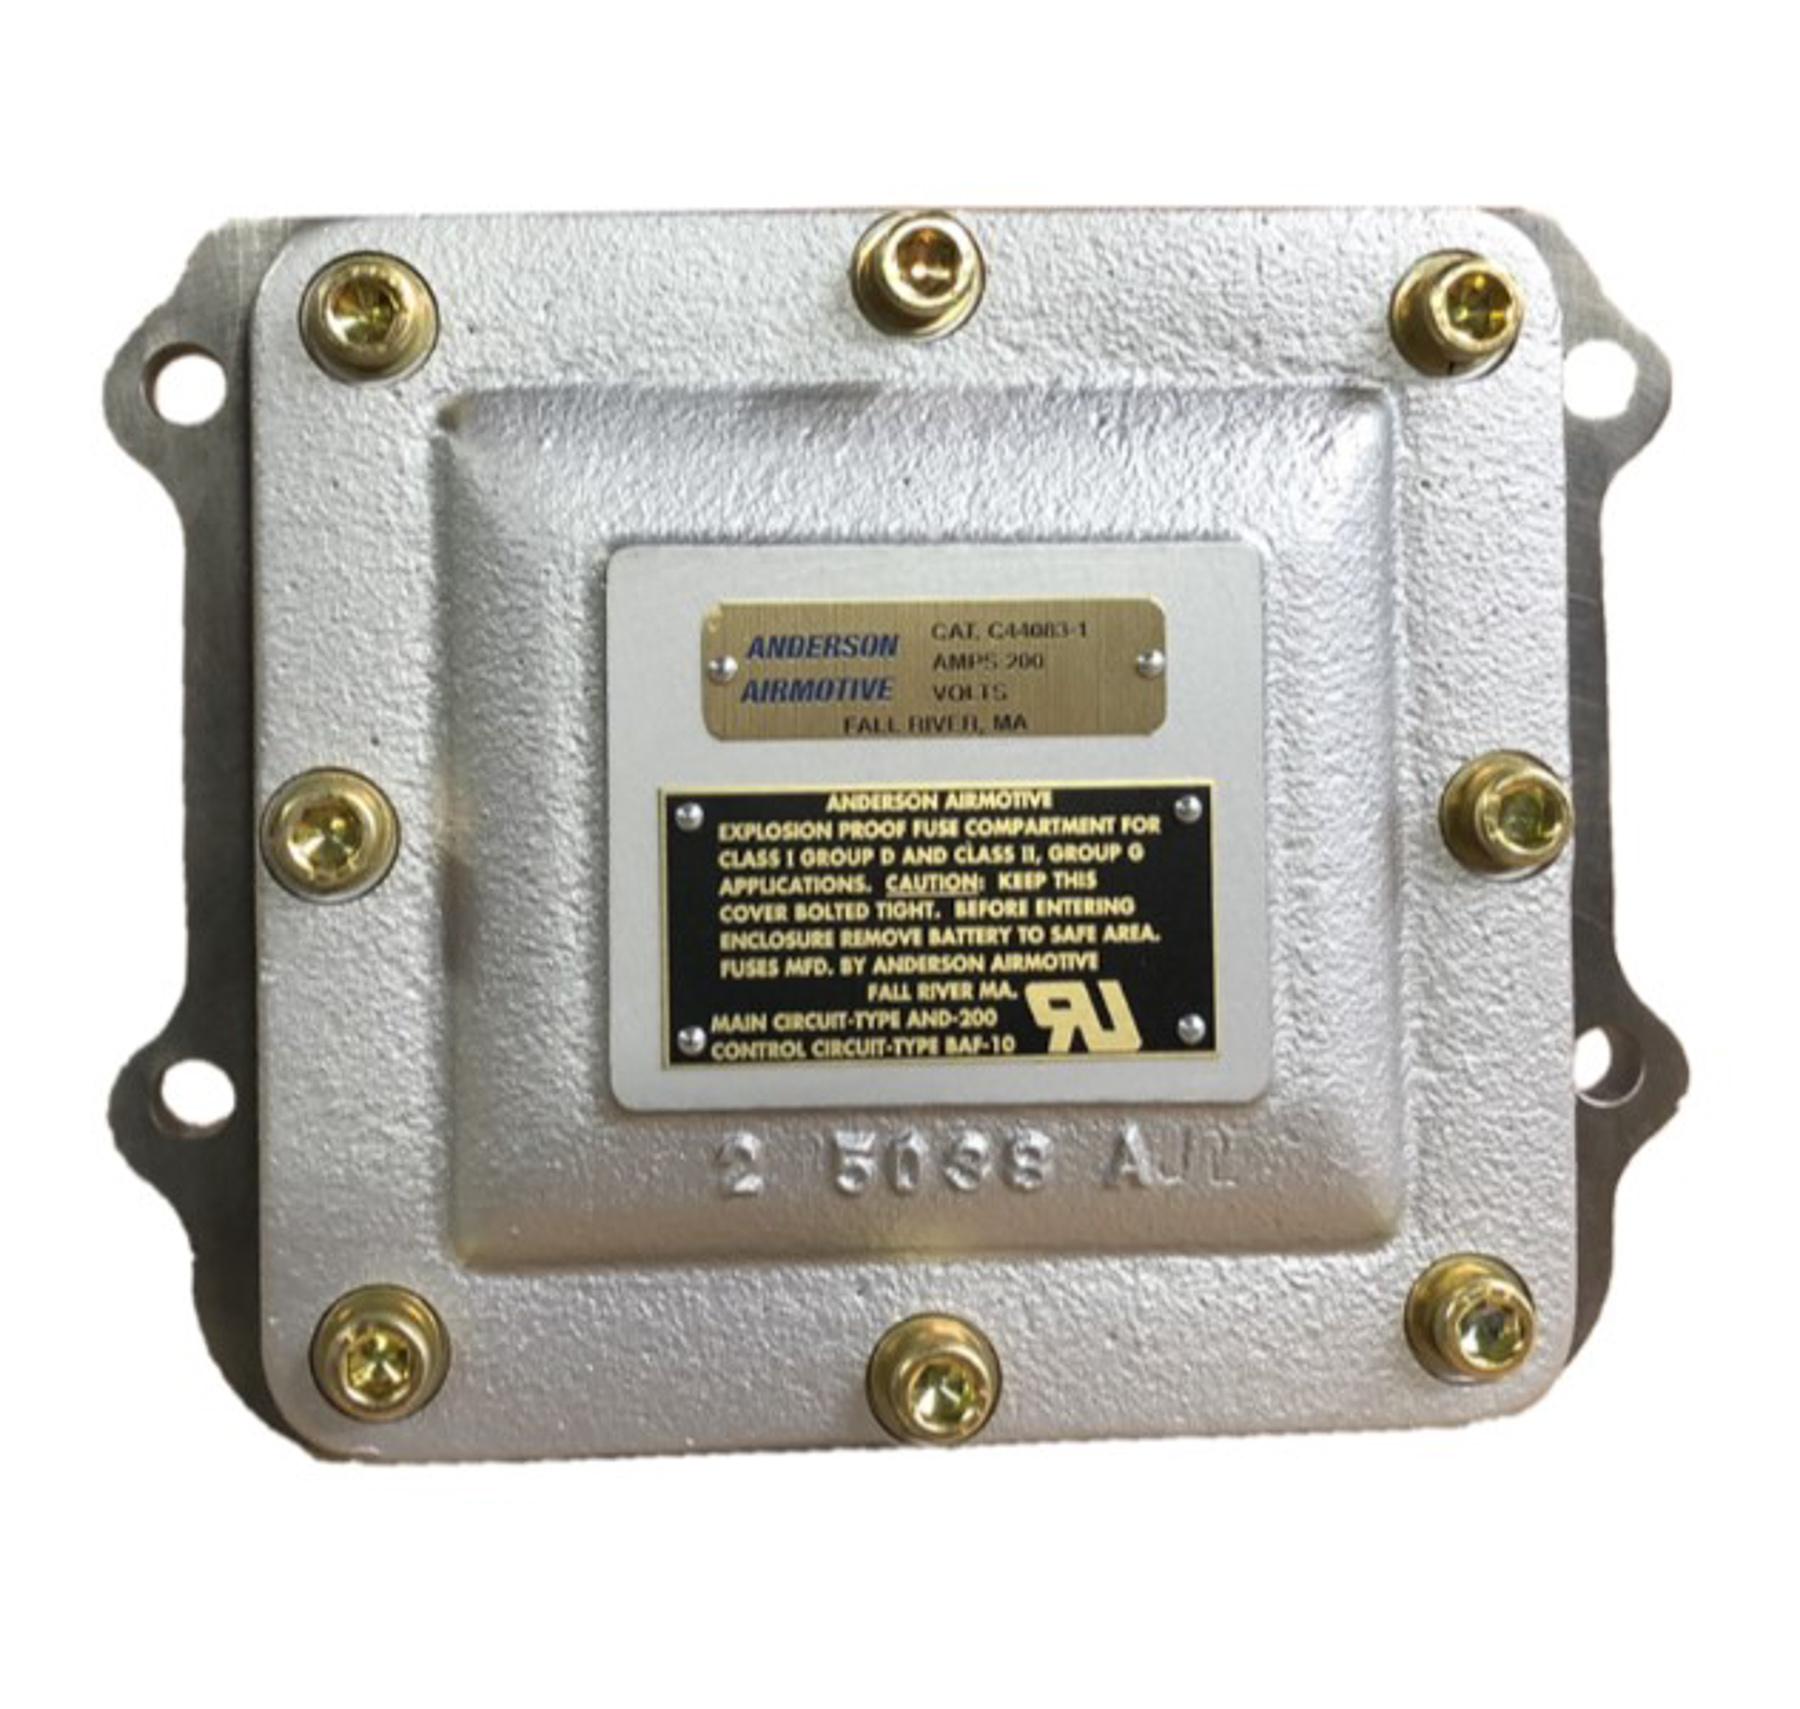 150 amp fuse box c44083 1 explosion proof fuse compartment  150 ampere anderson  explosion proof fuse compartment